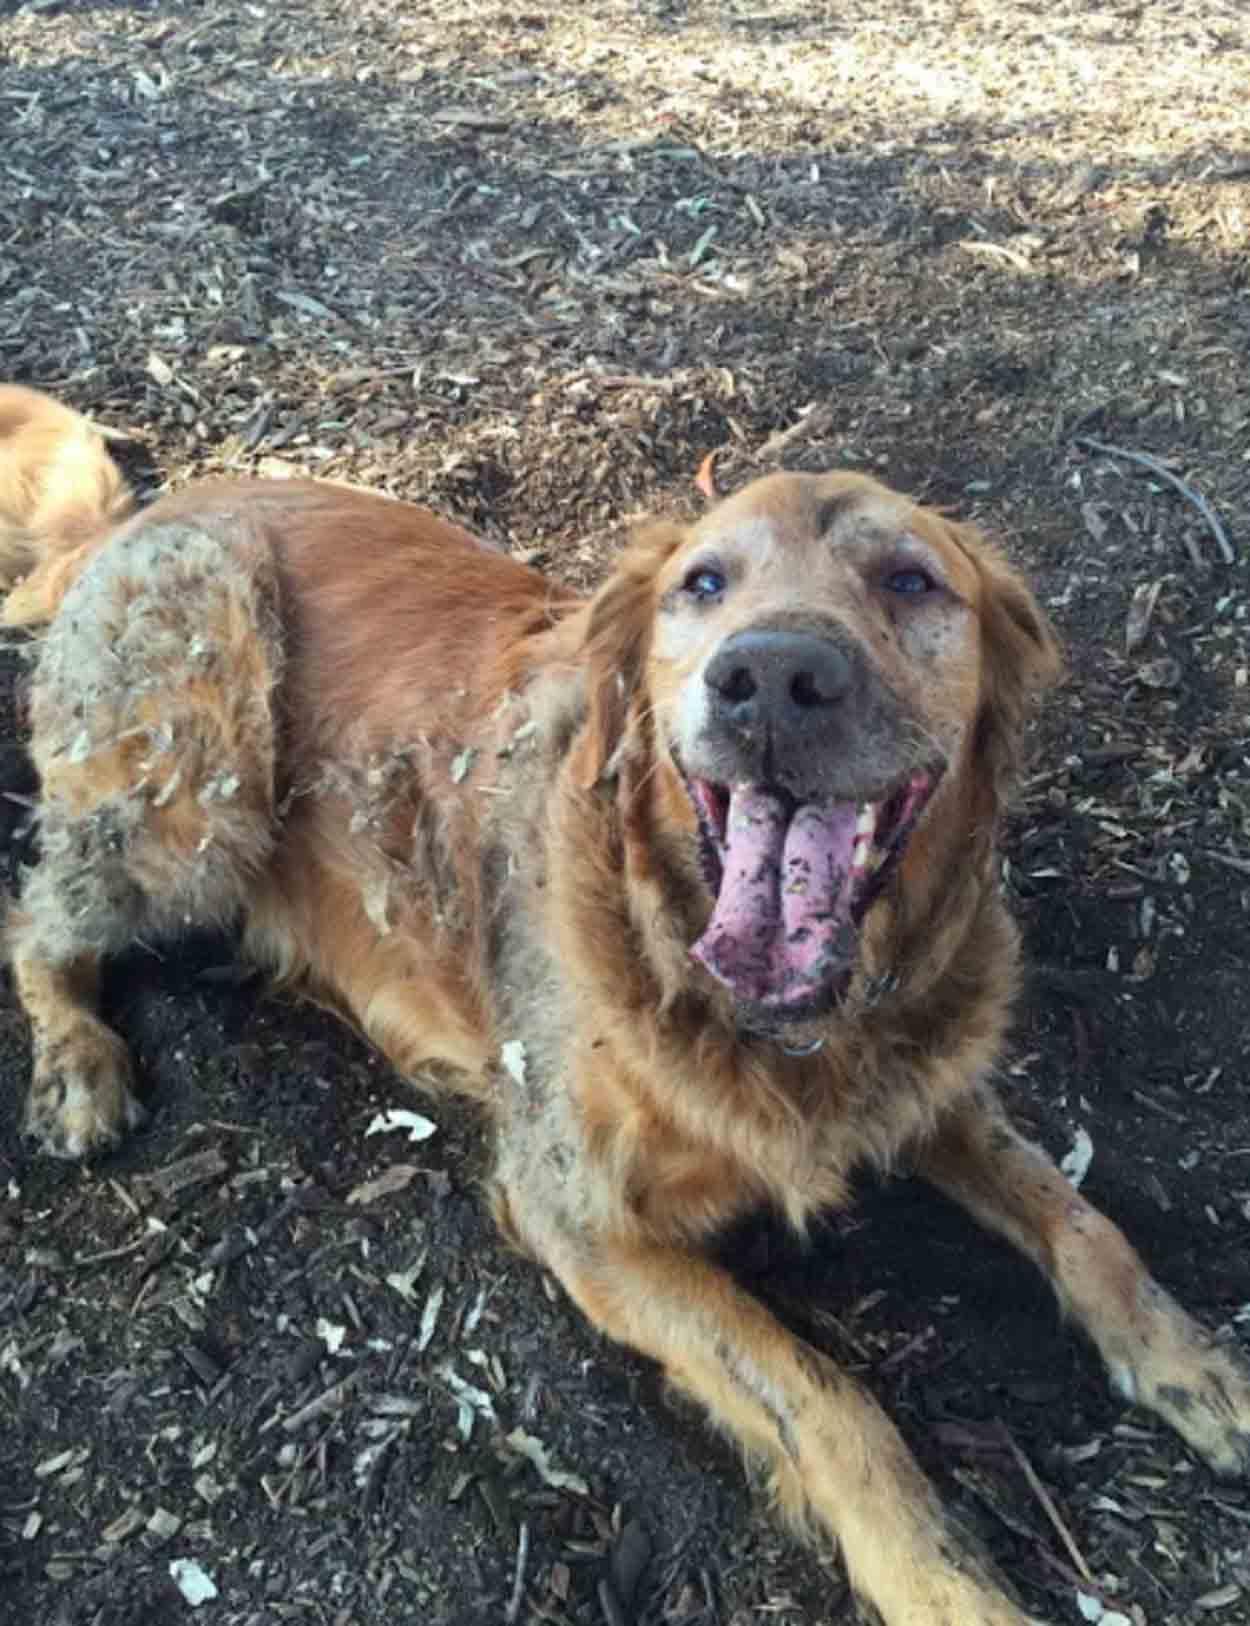 Adorable perro dorado